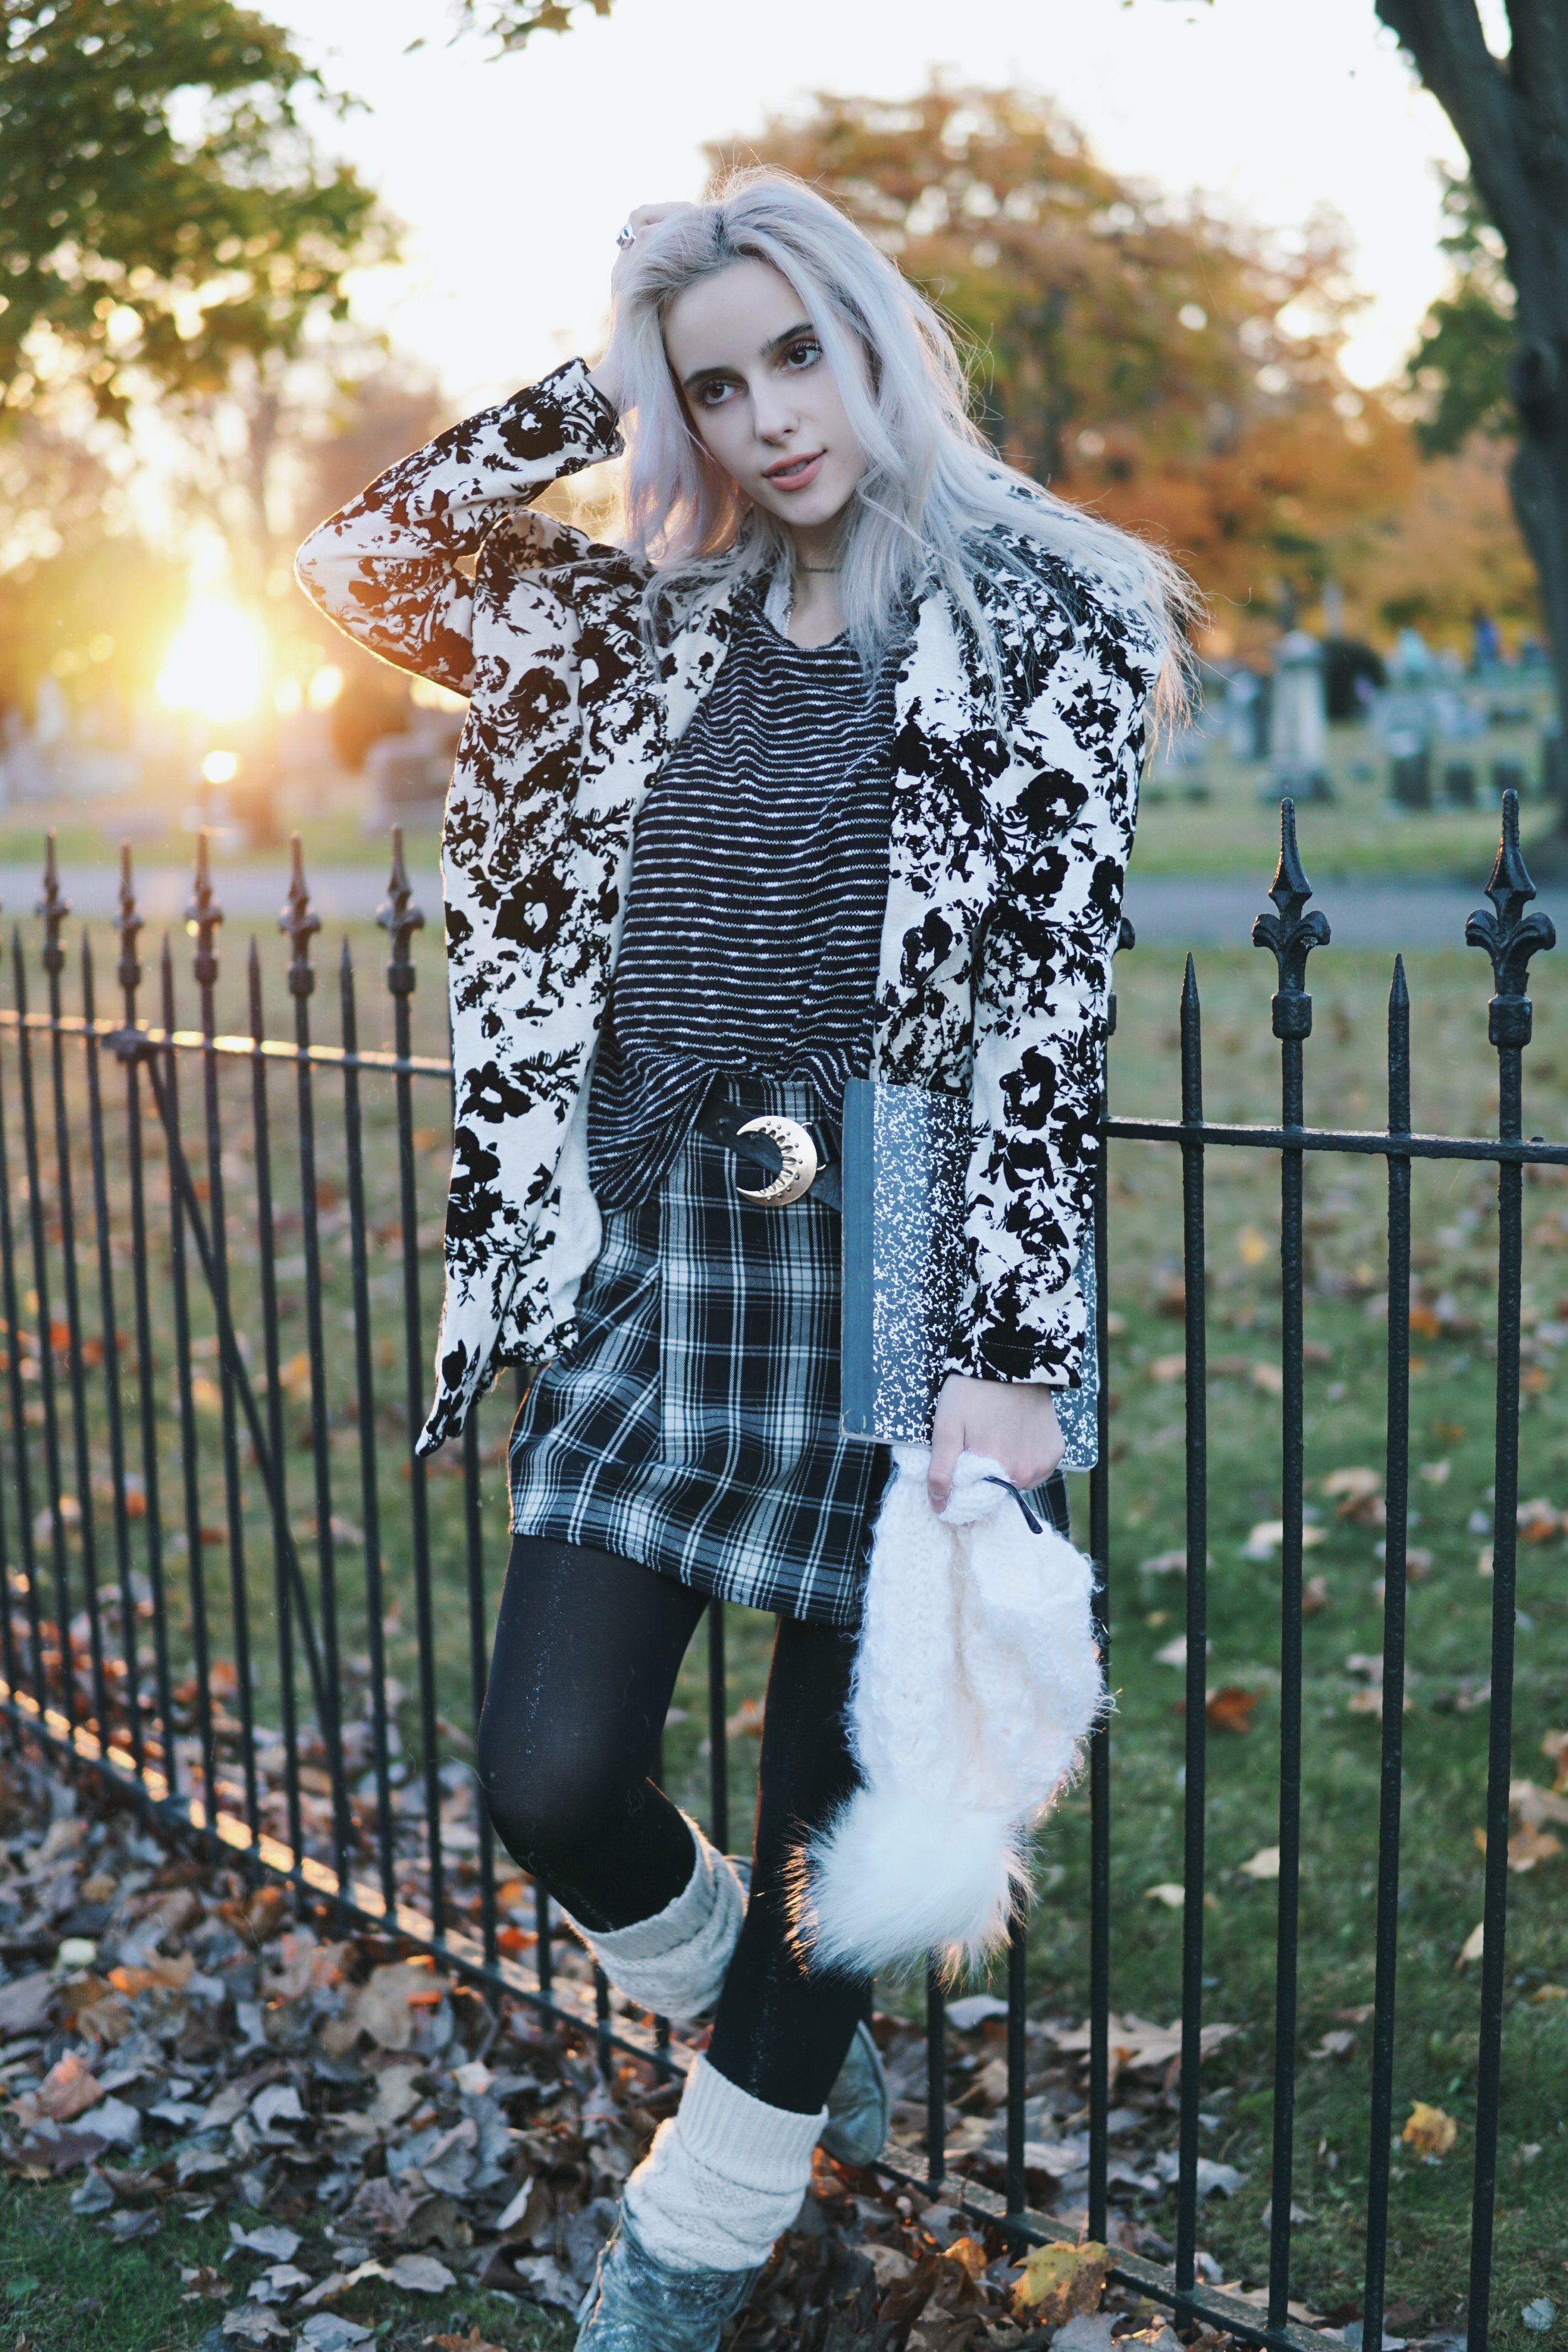 jacket:  free people    sweater:  forever 21    skirt:  brandy melville    hat:  princessaanastasiya    belt:  free people